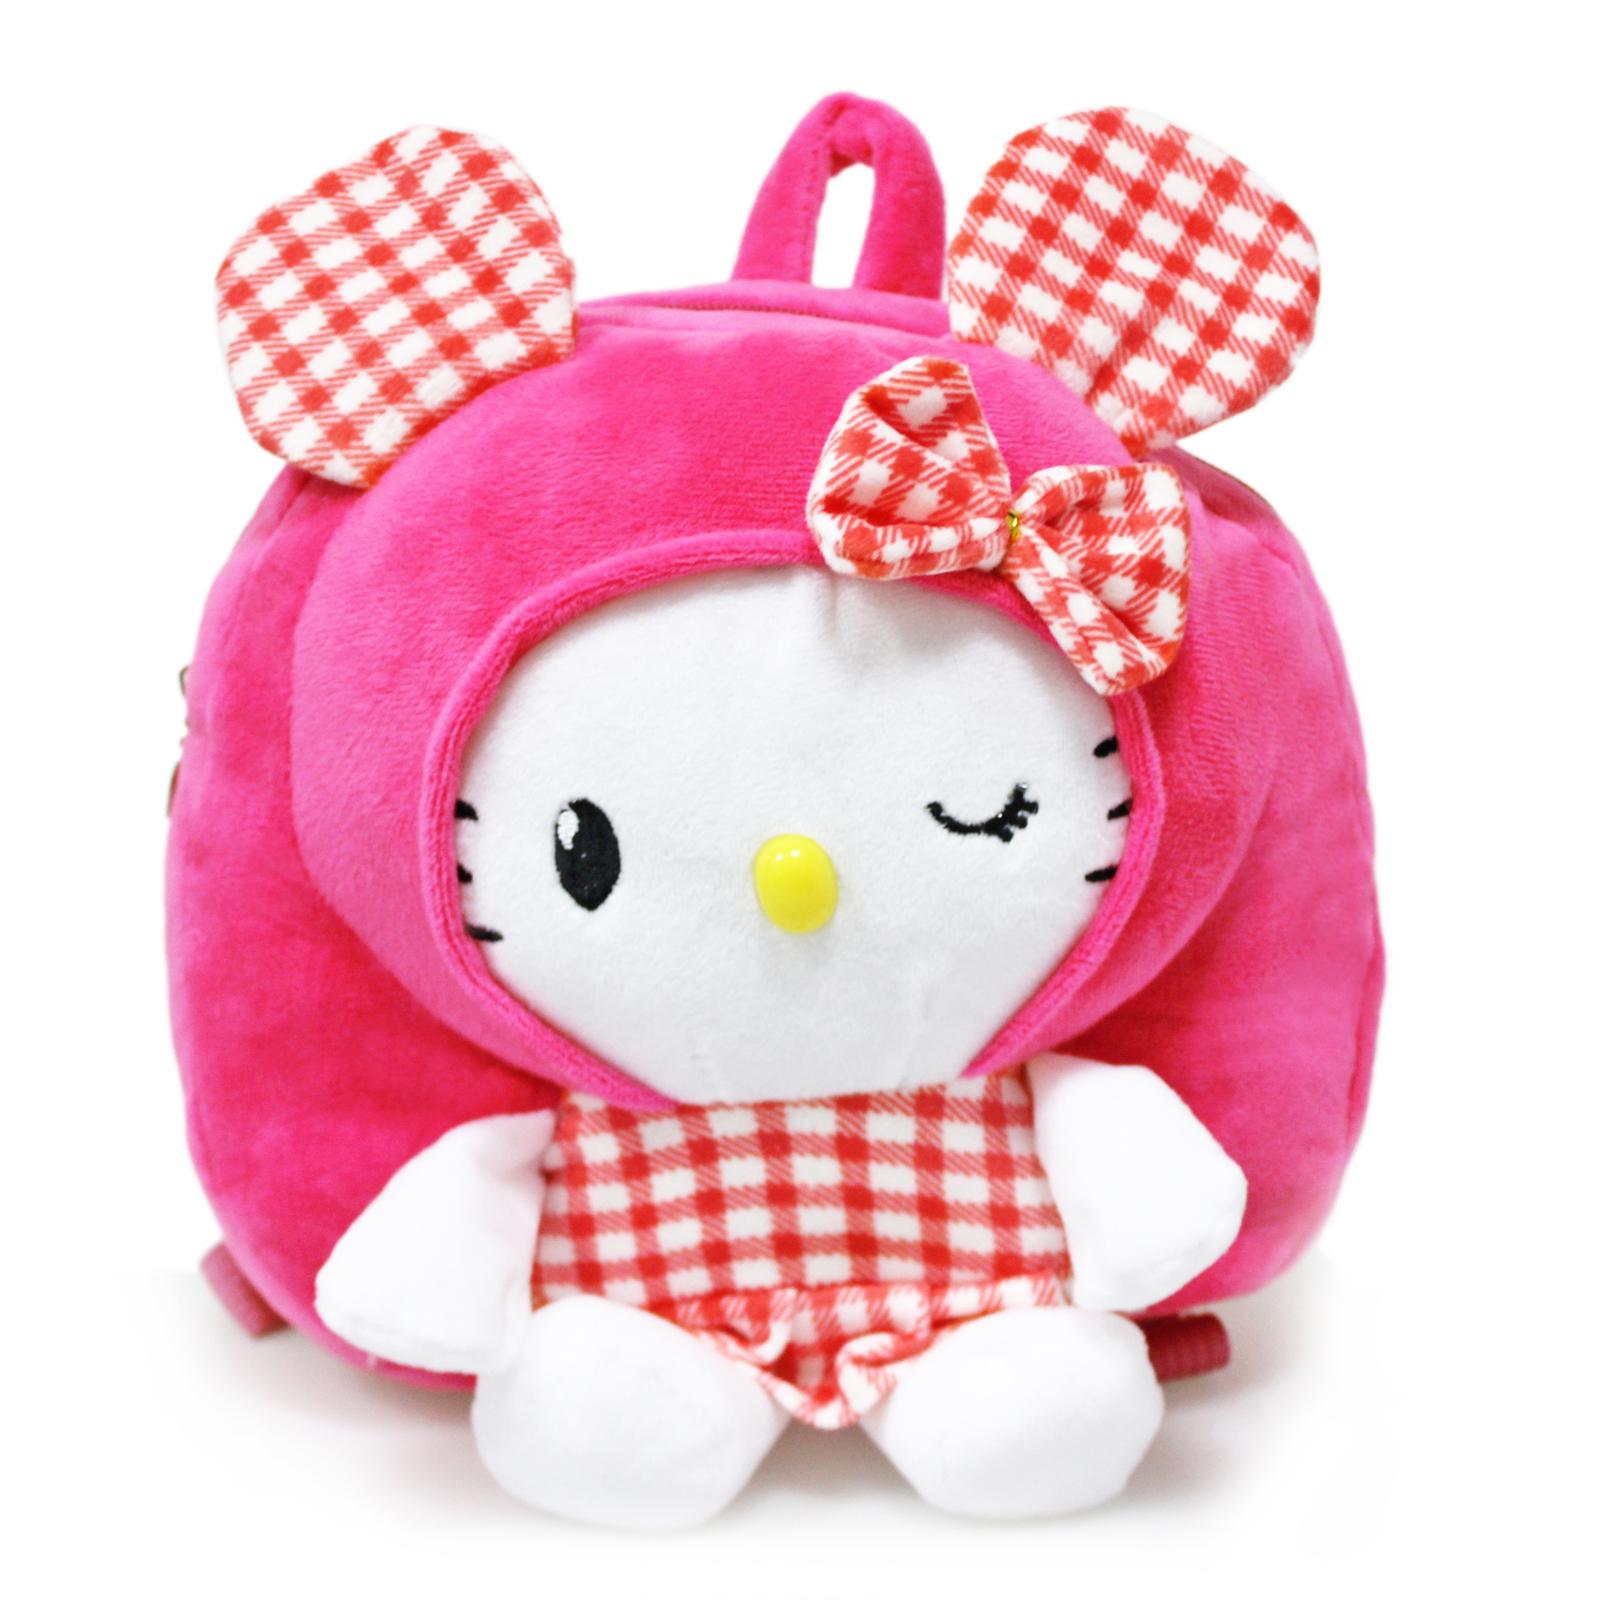 e00ed2c141b6 Details about The New Owl Kitty 3D Cartoon Rabbit Bag Toddler Children  School Bag Rucksack TO